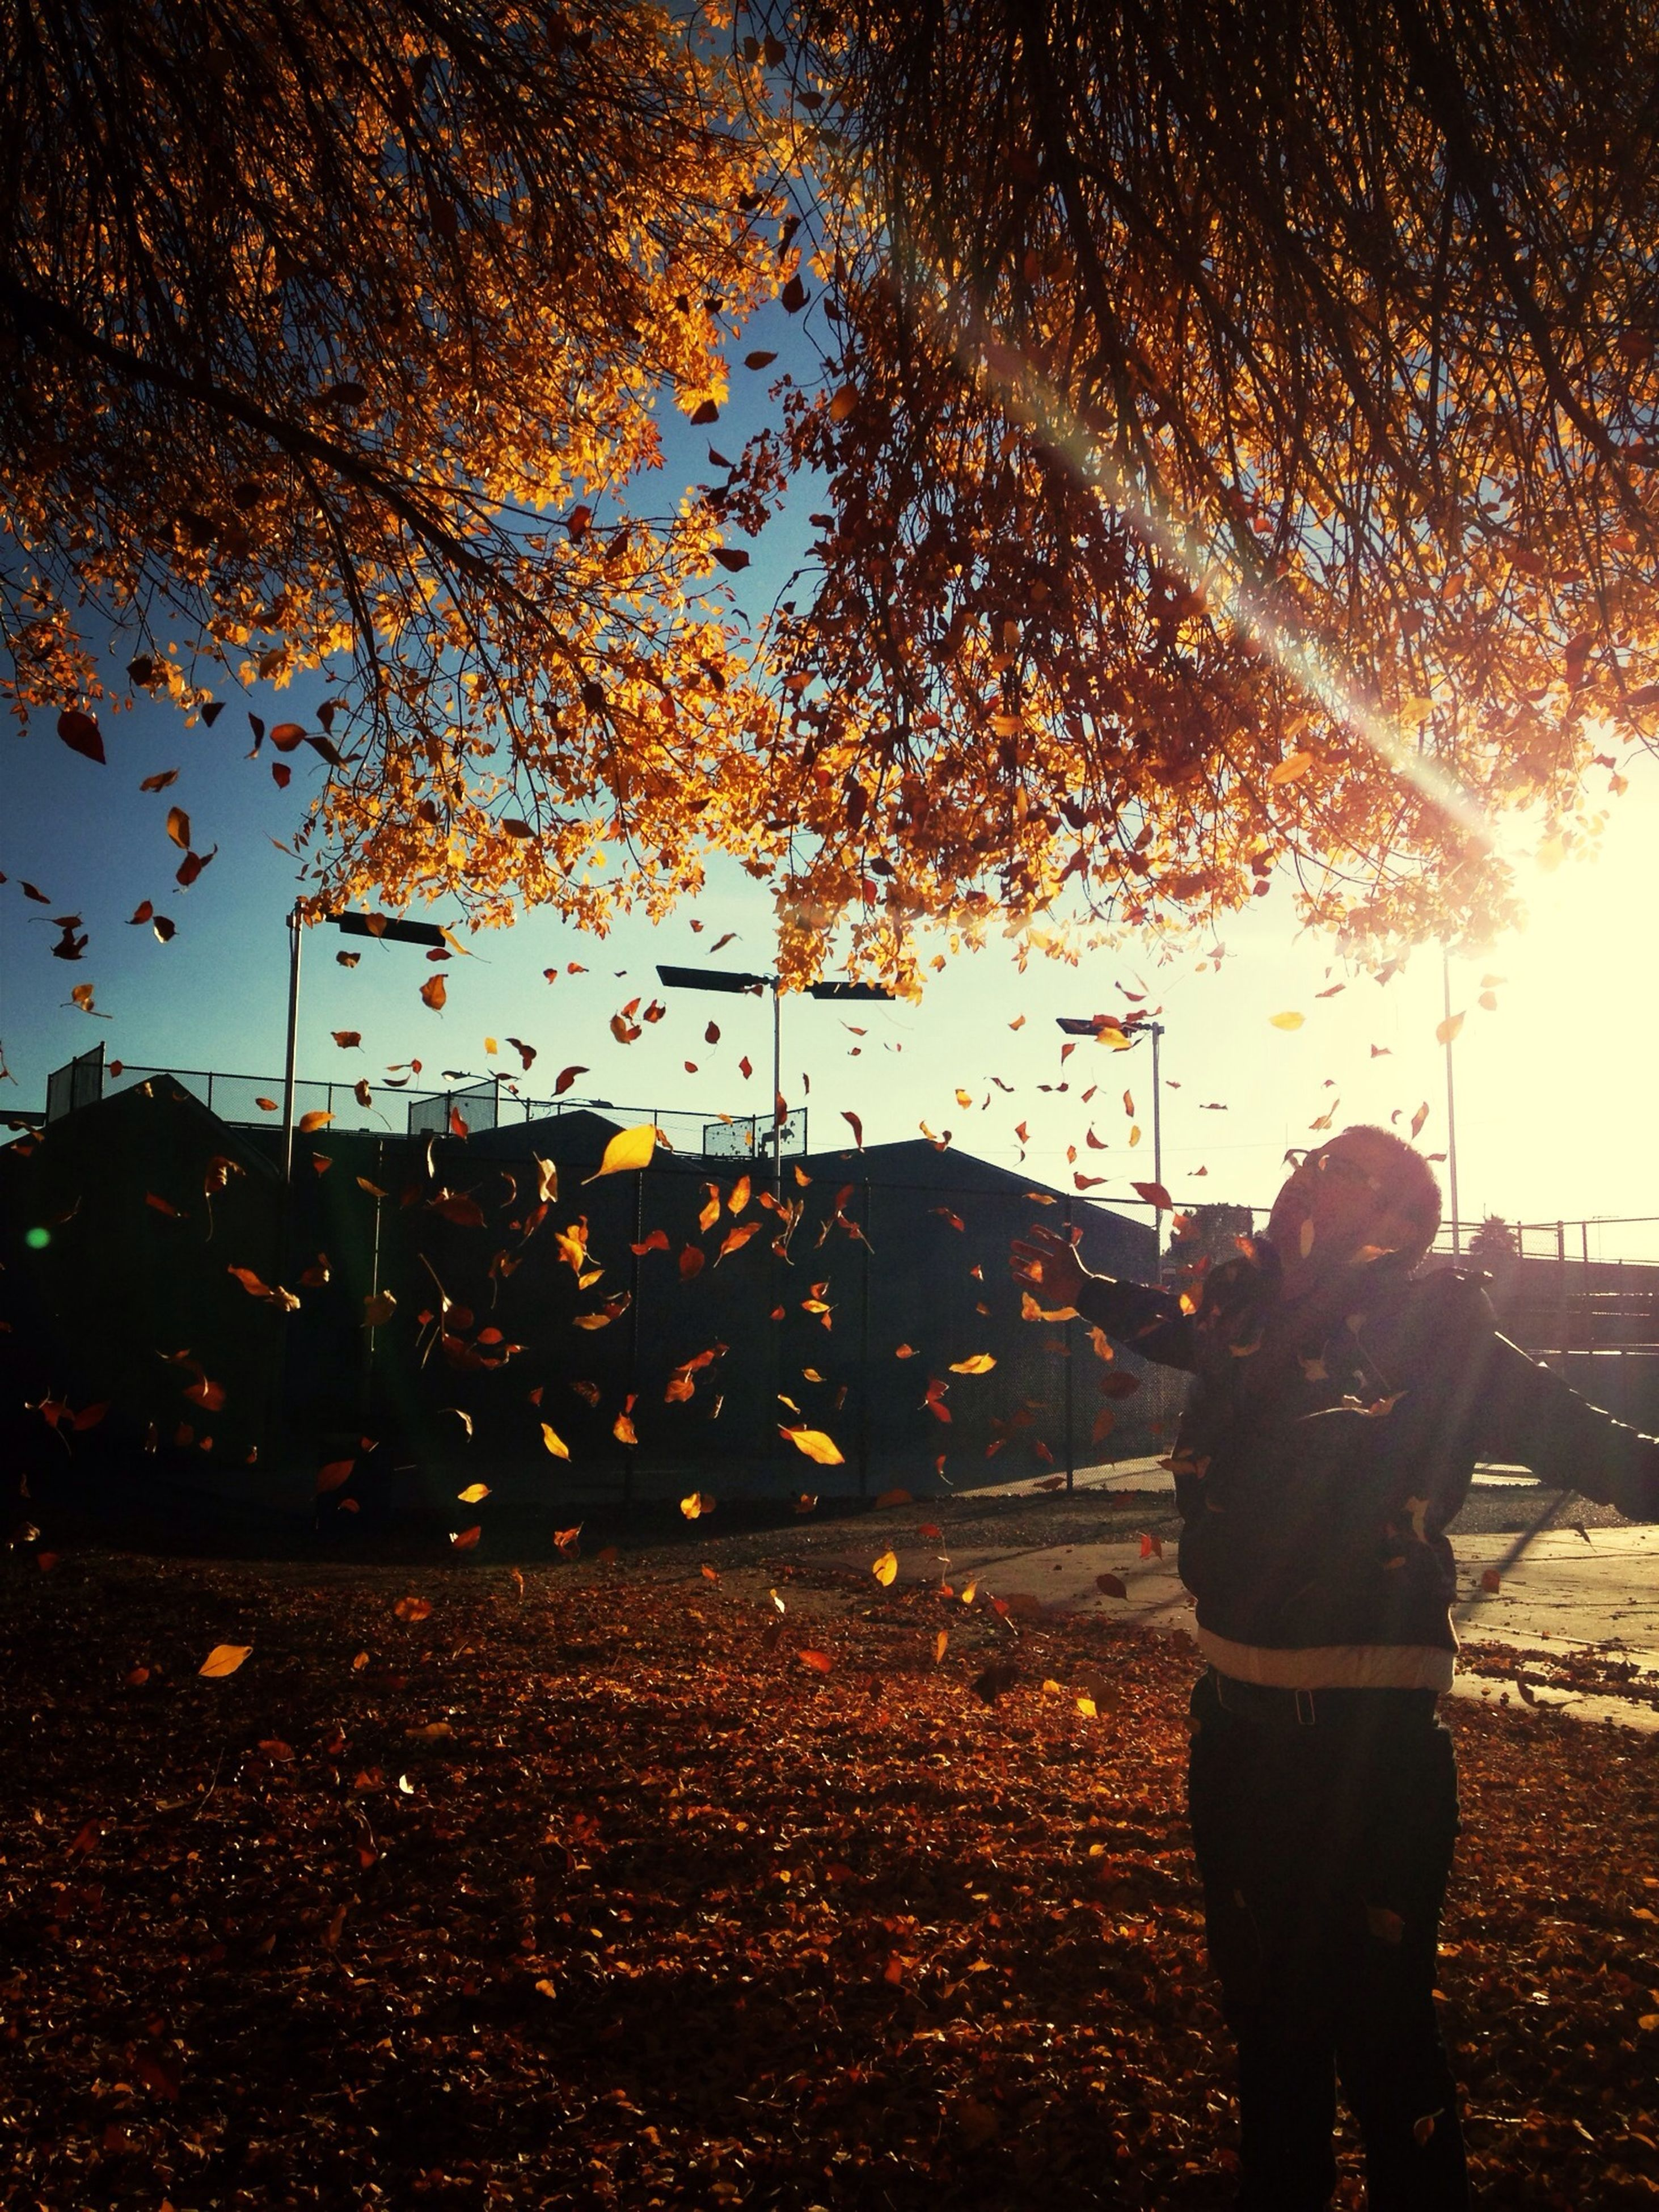 lifestyles, tree, leisure activity, men, street, season, rear view, standing, walking, full length, silhouette, road, rain, transportation, person, city, illuminated, car